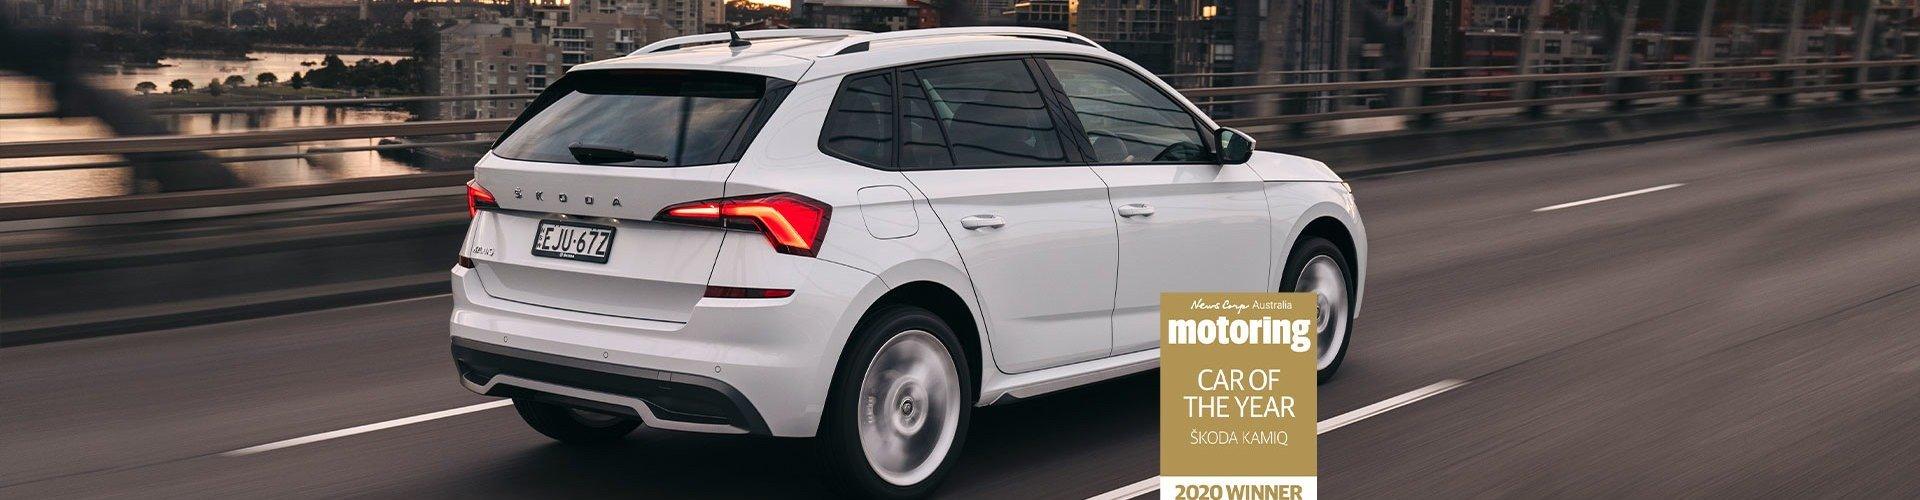 SKODA Kamiq Car of the Year 2020